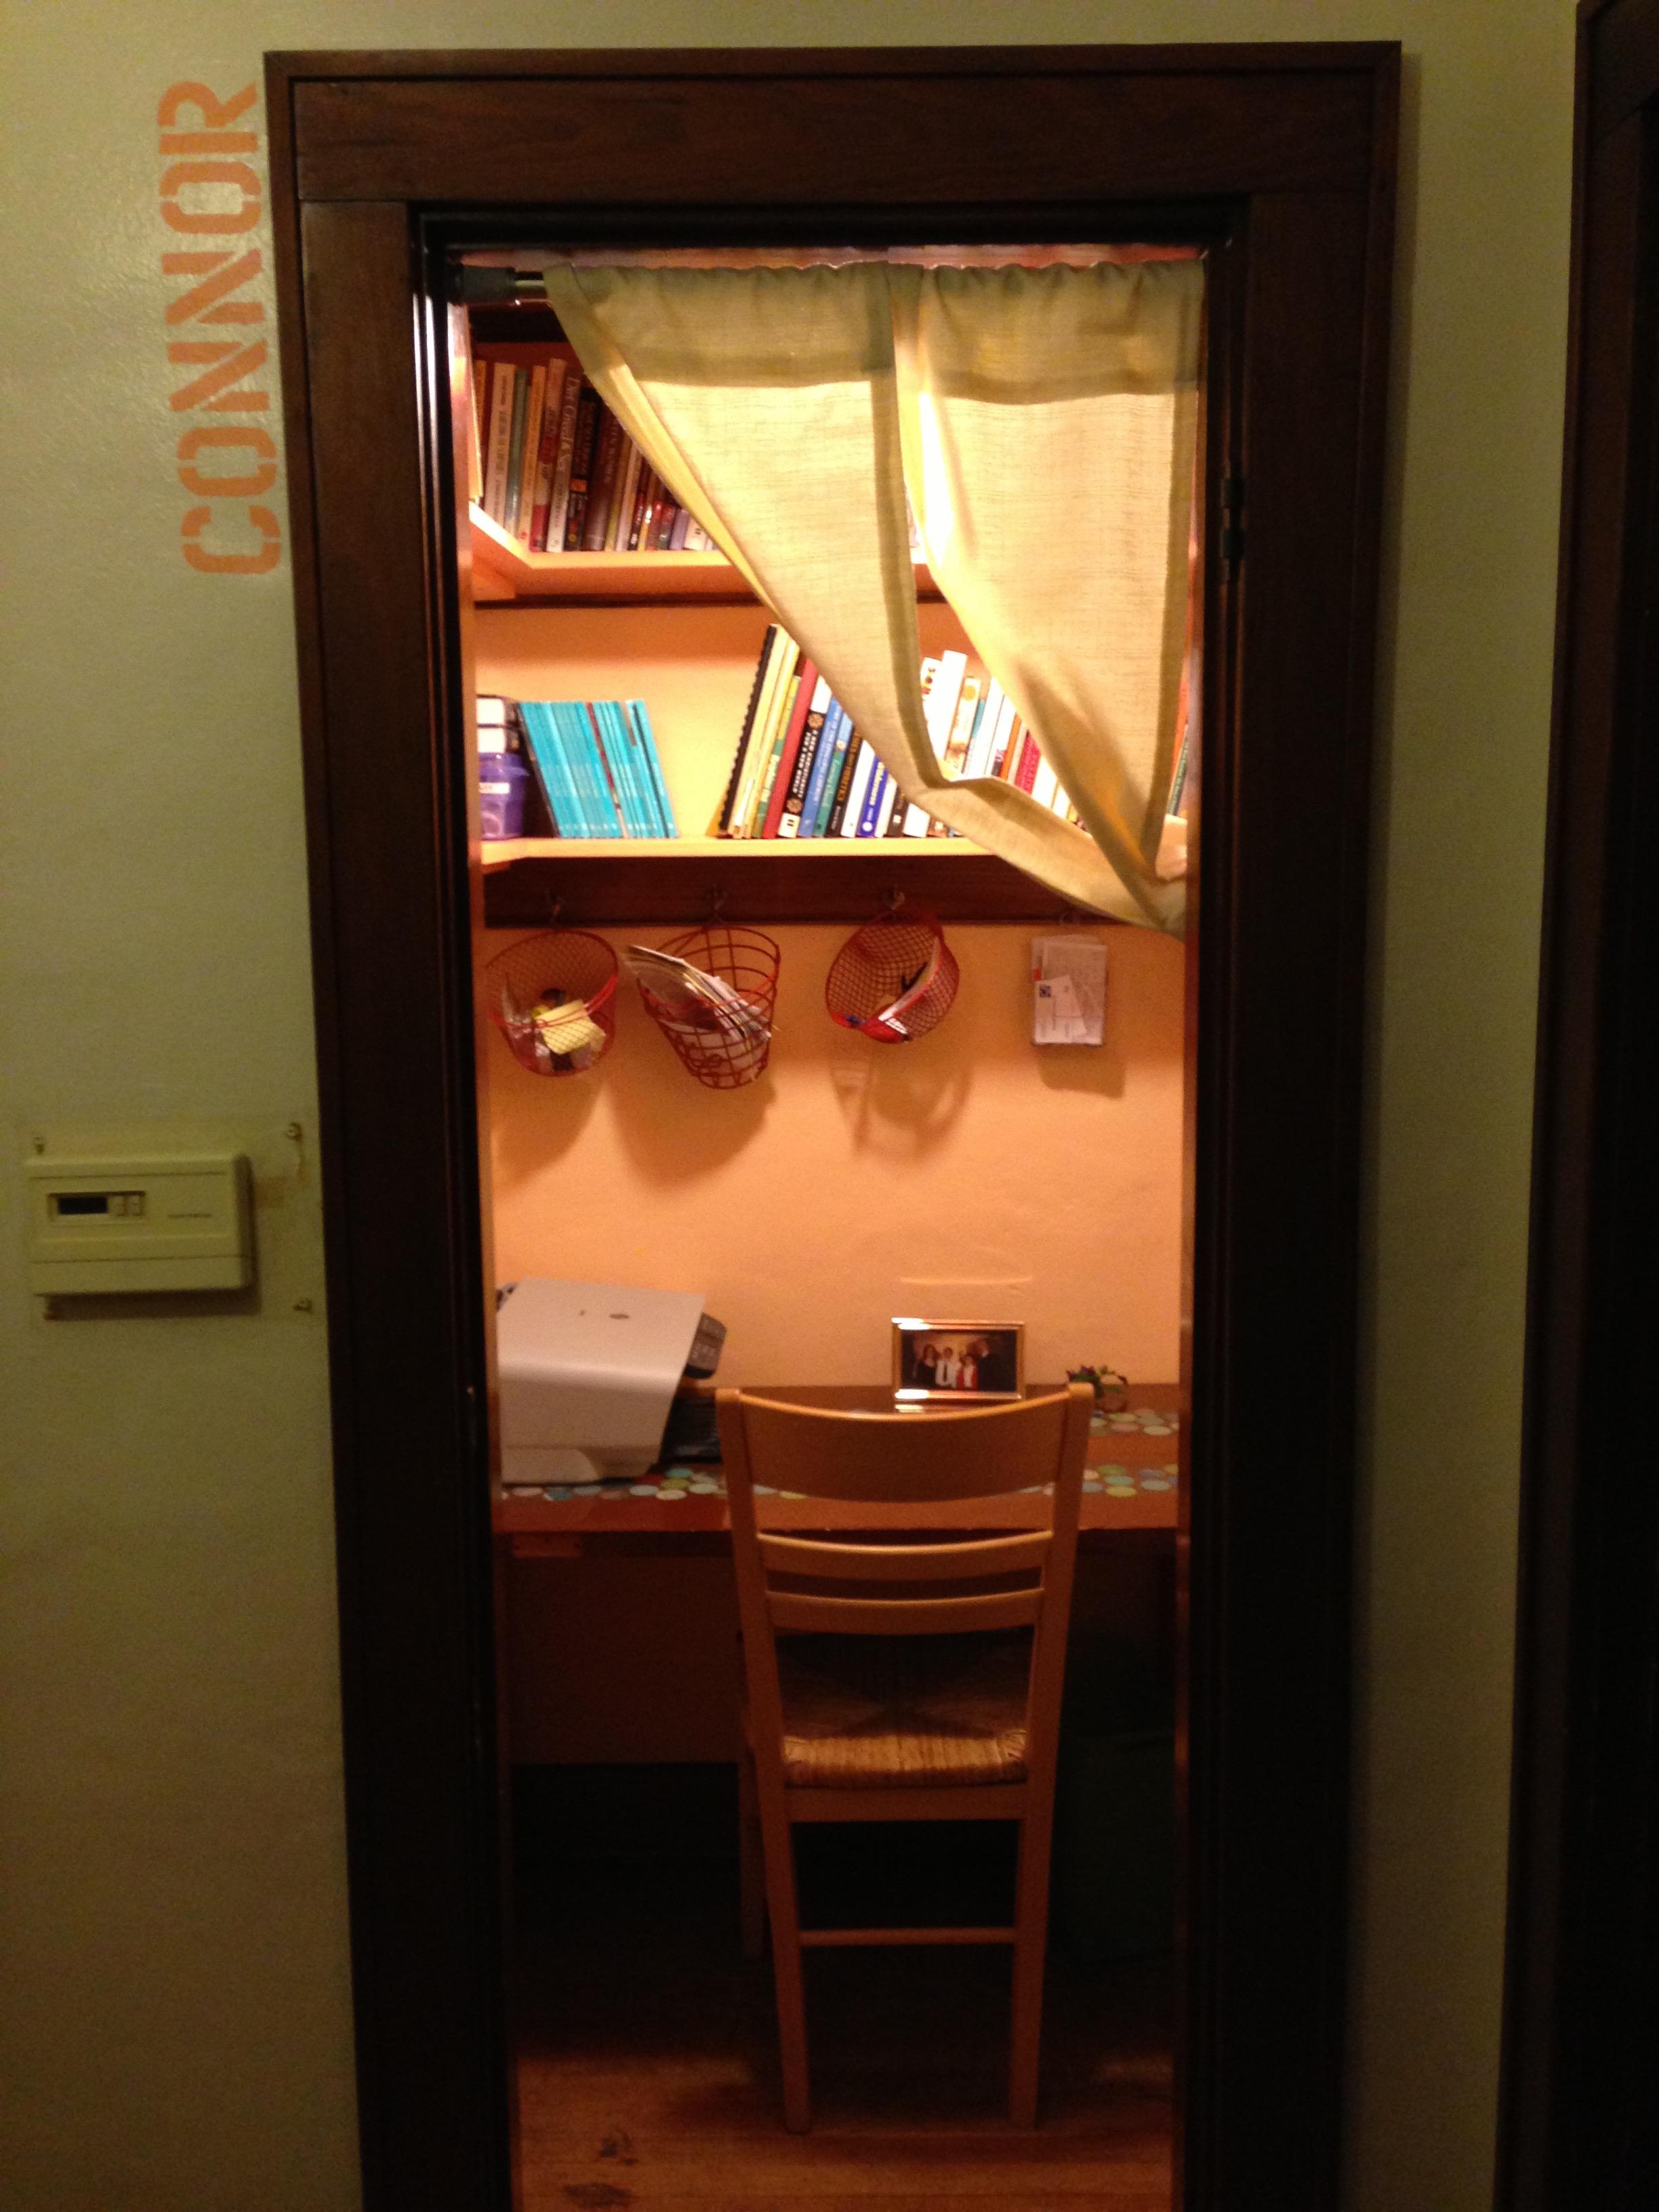 Alice's new closet office, or cloffice